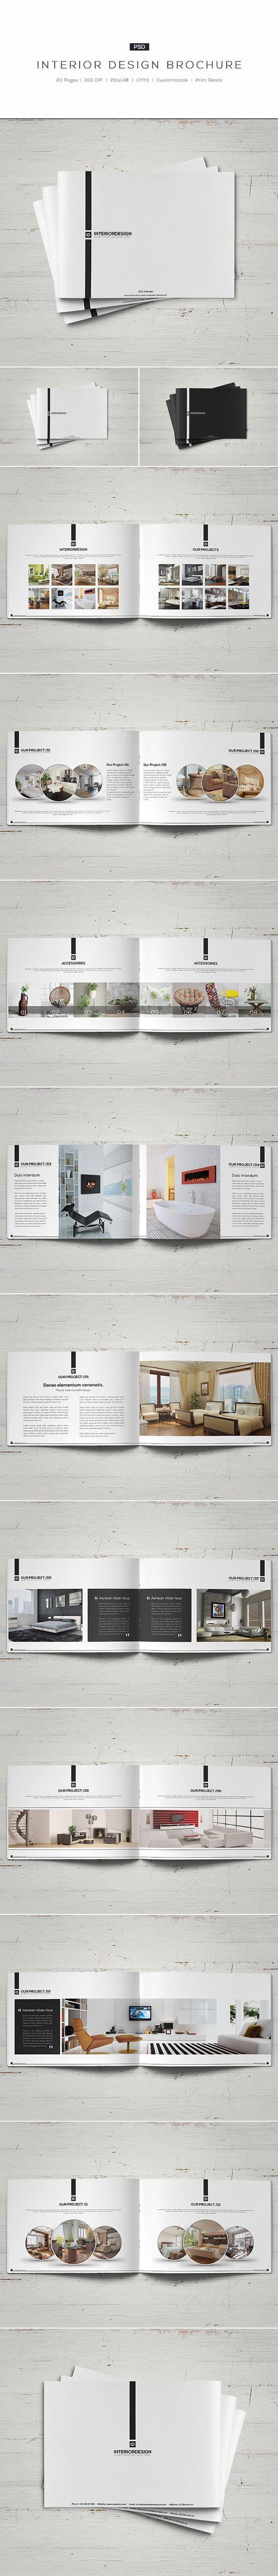 interior design brochure on behance - Interior Design Portfolio Ideas